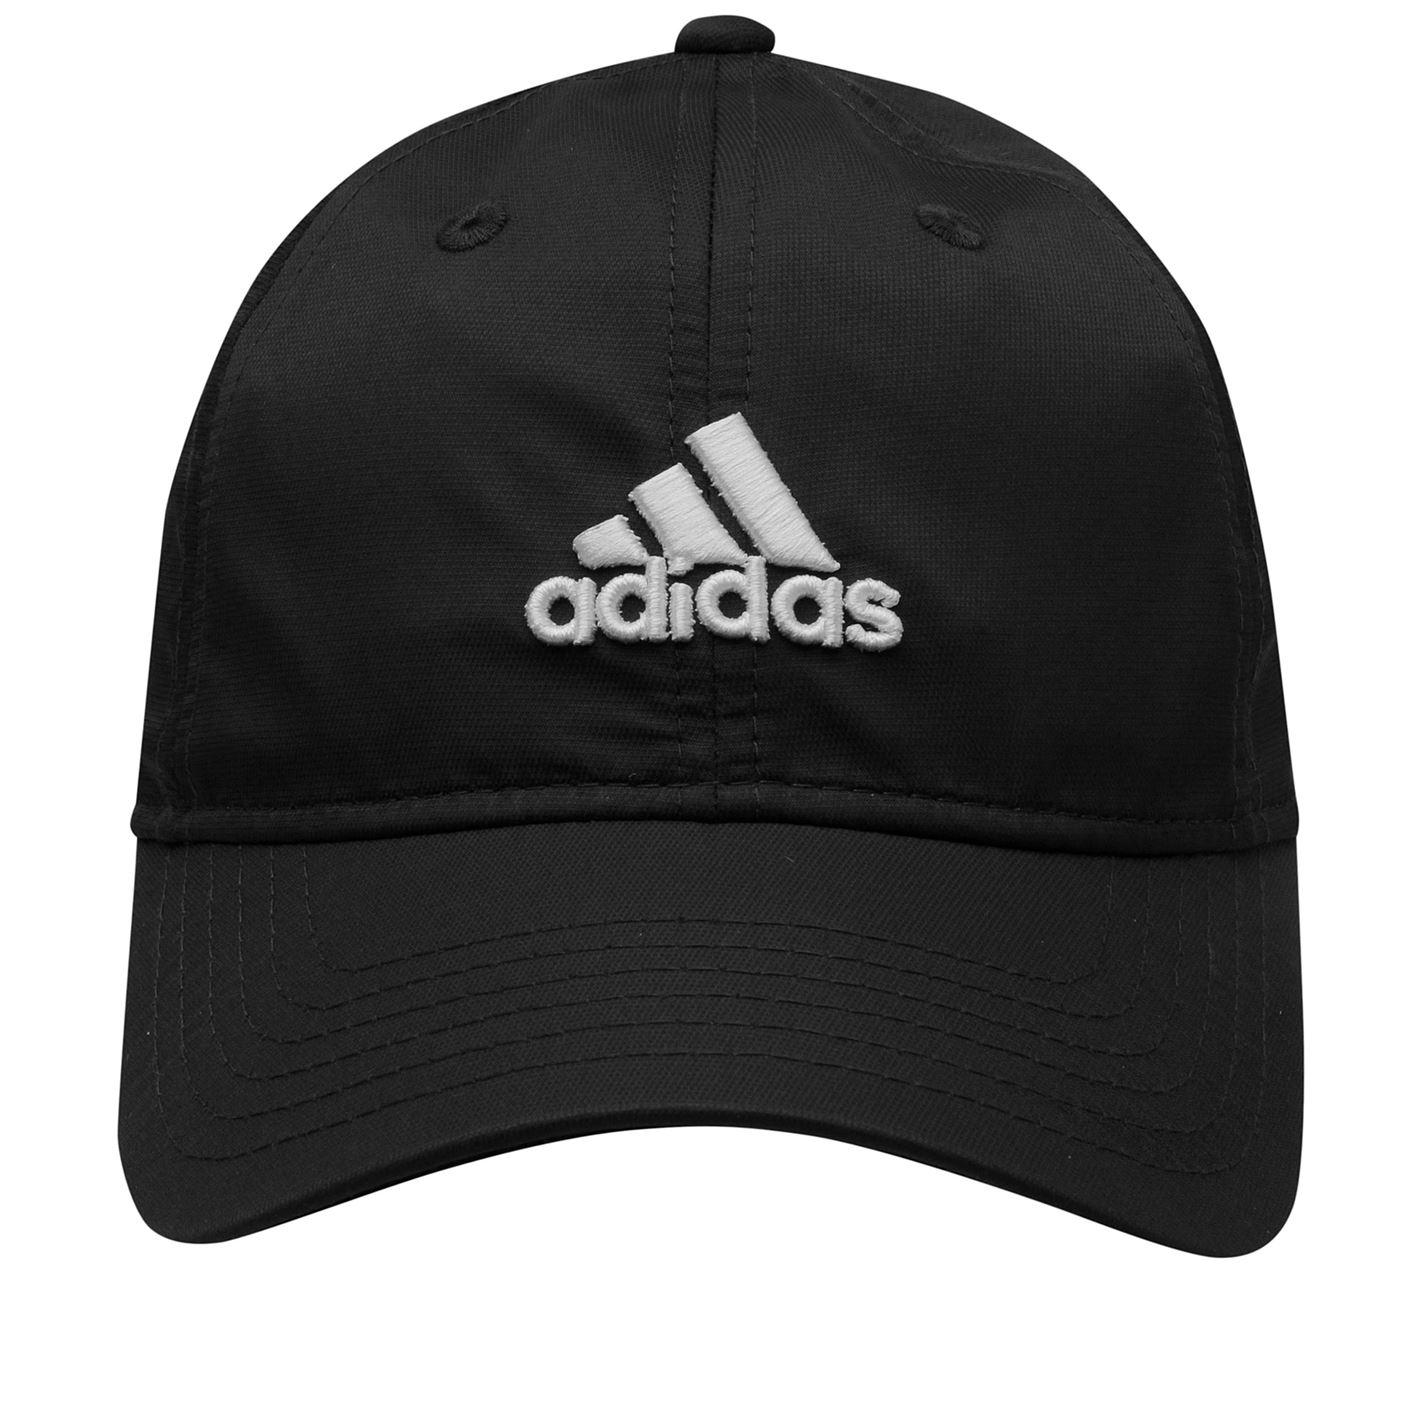 Pánska šiltovka Adidas Golf cap